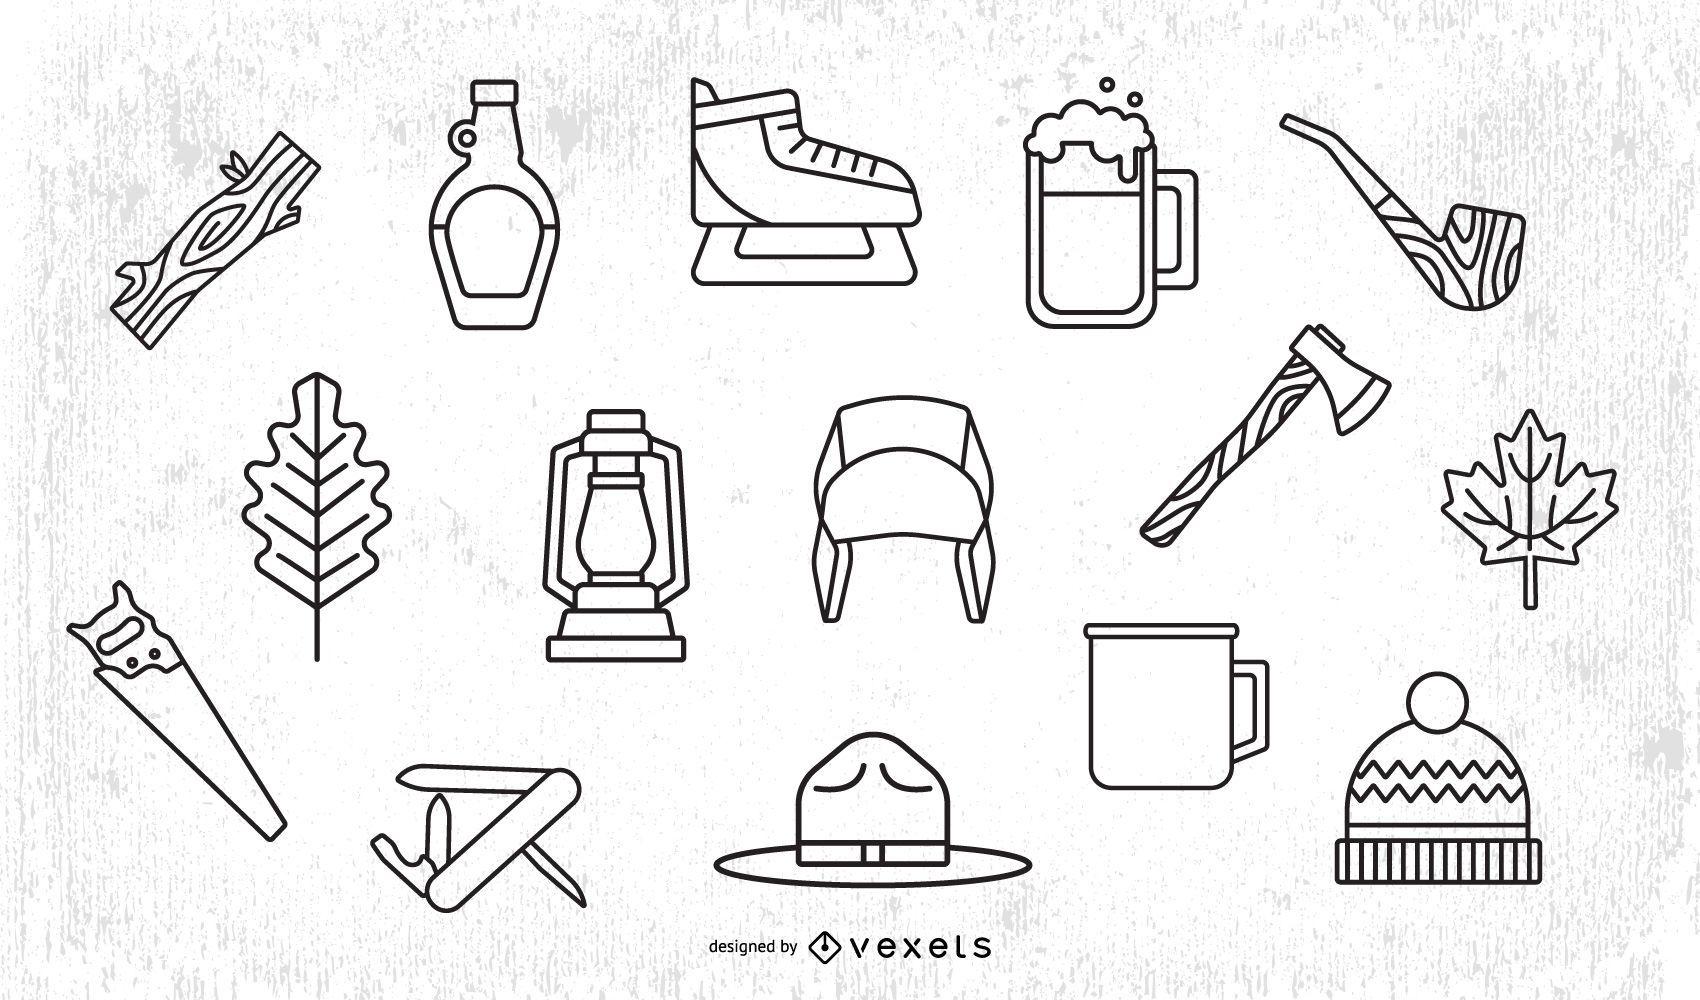 Lumberjack Elements Stroke Design Pack